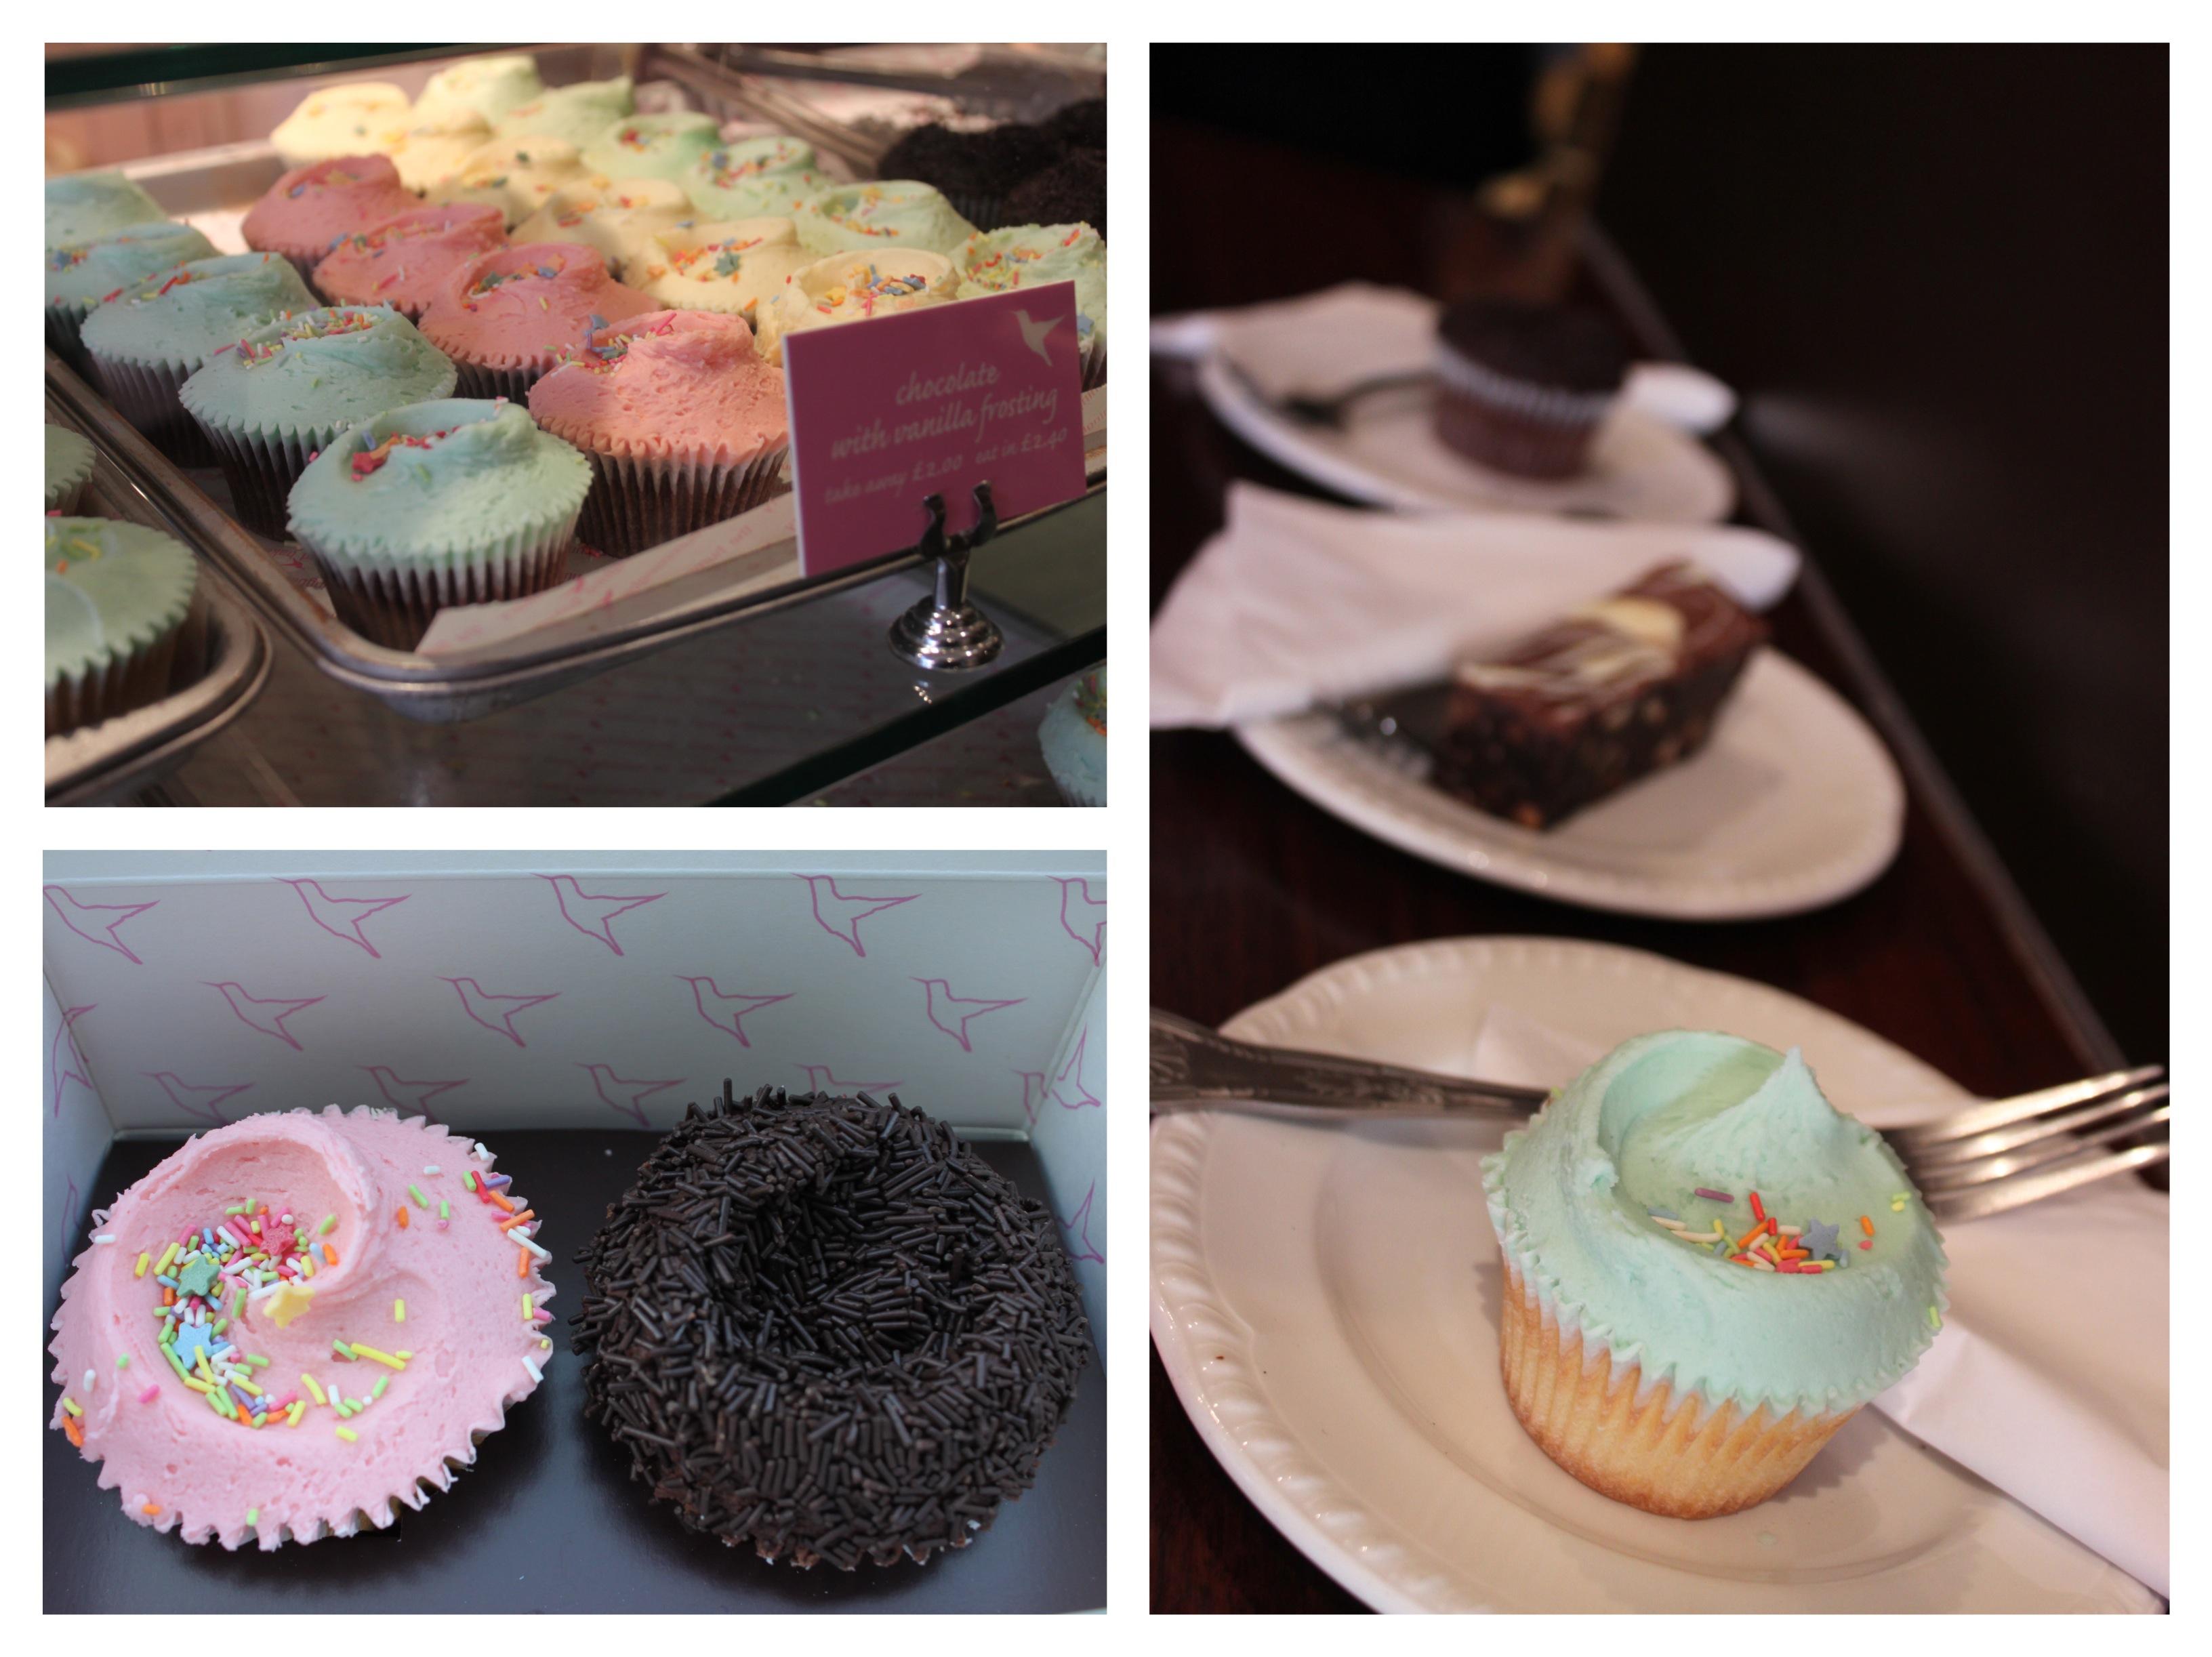 hummingbird bakery london portobello cupcake